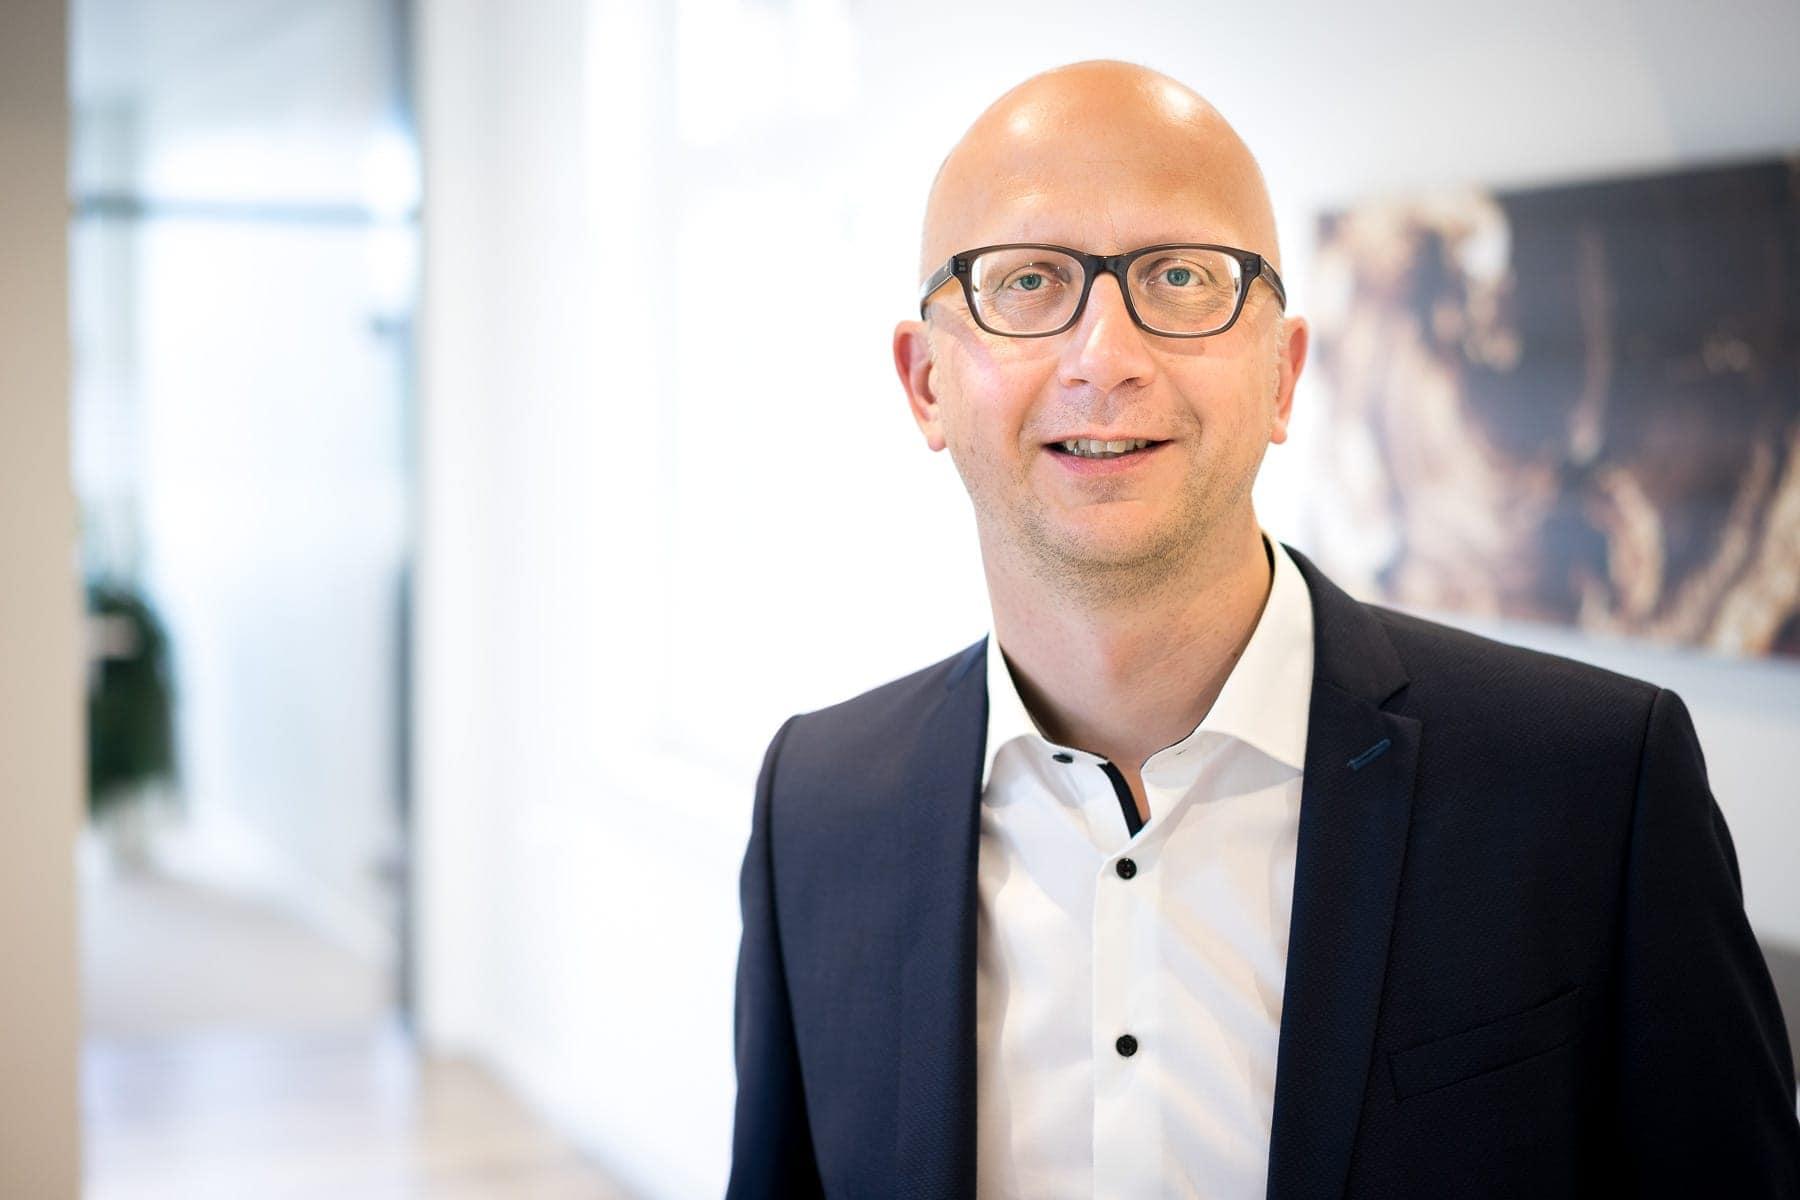 Dr. Stefan Baumeier